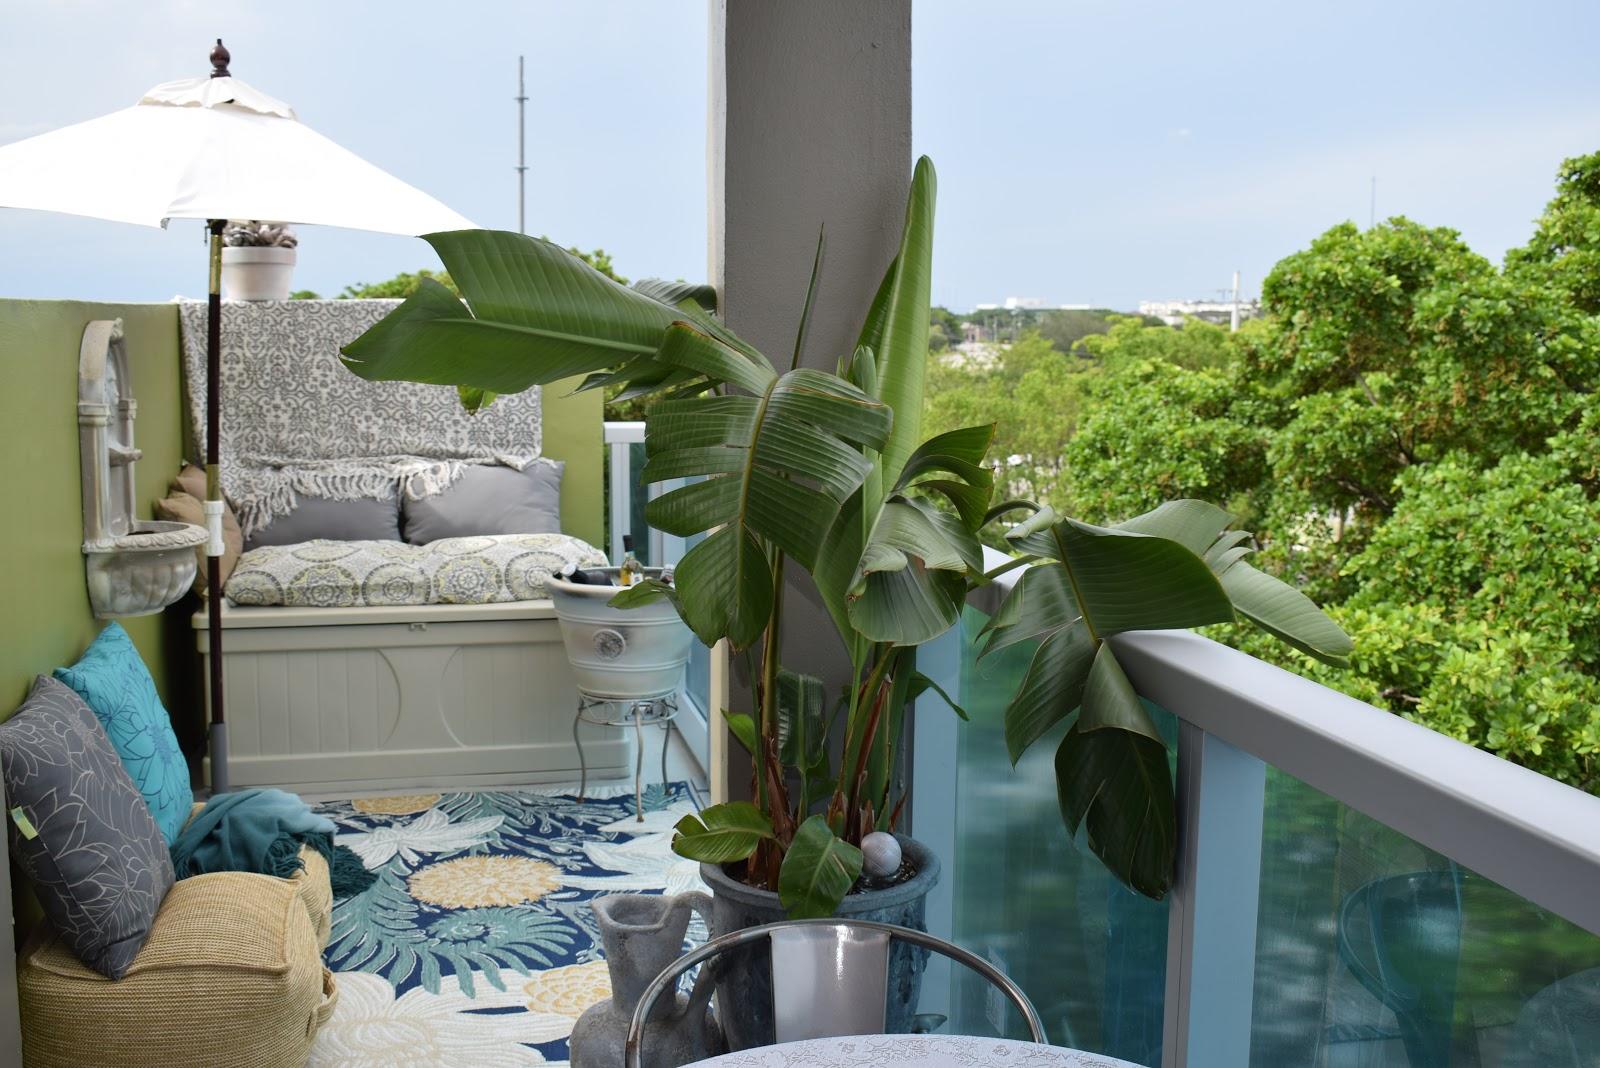 Outdoor area rugs, Sunbrella, patio cushions, throws, pillows, fiberglass fountains,  By: JoFer Interiors